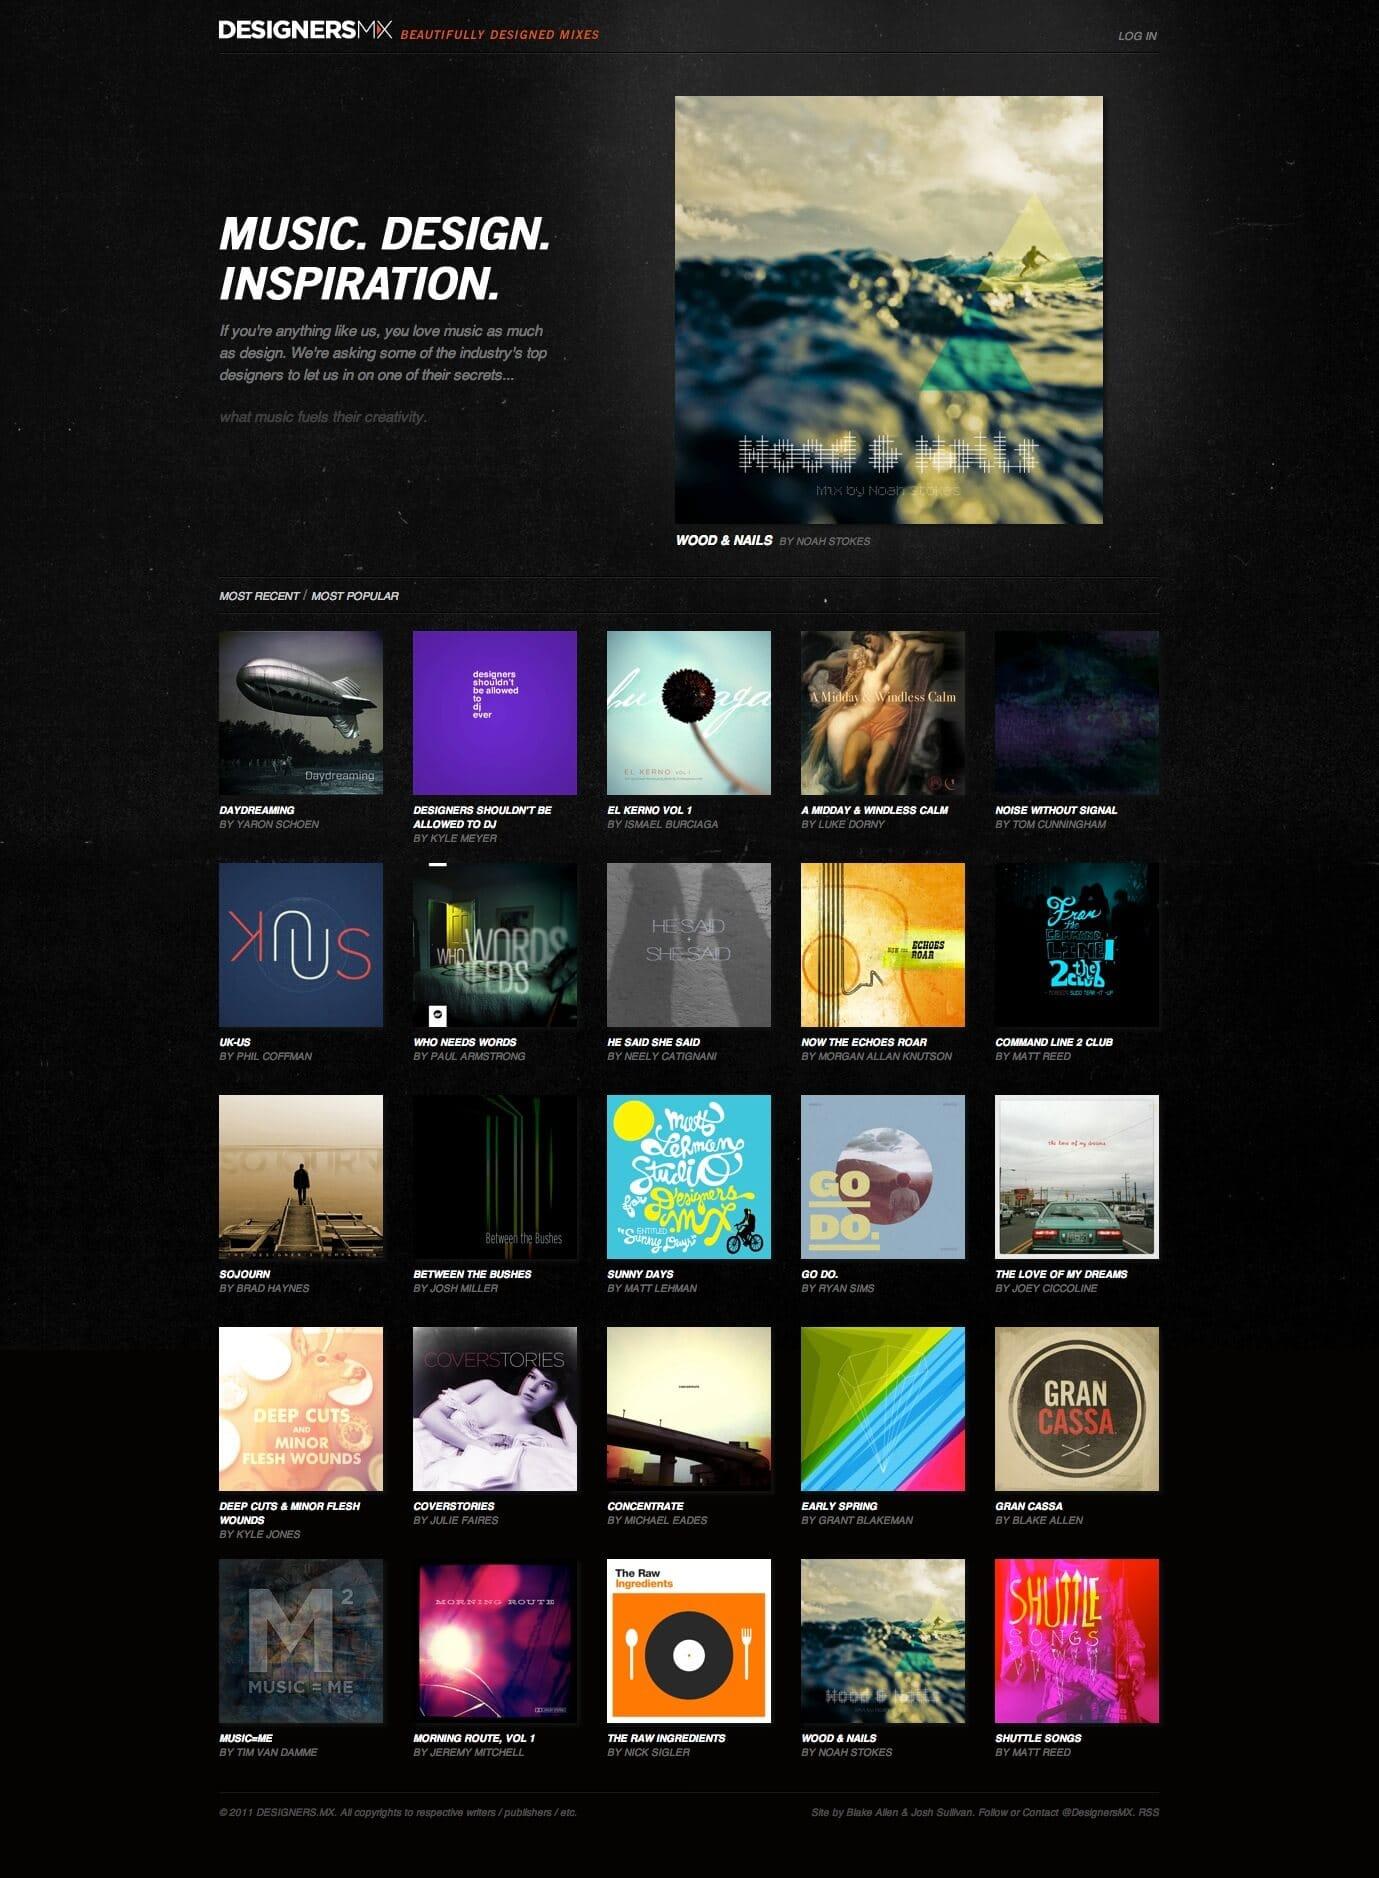 designers mx